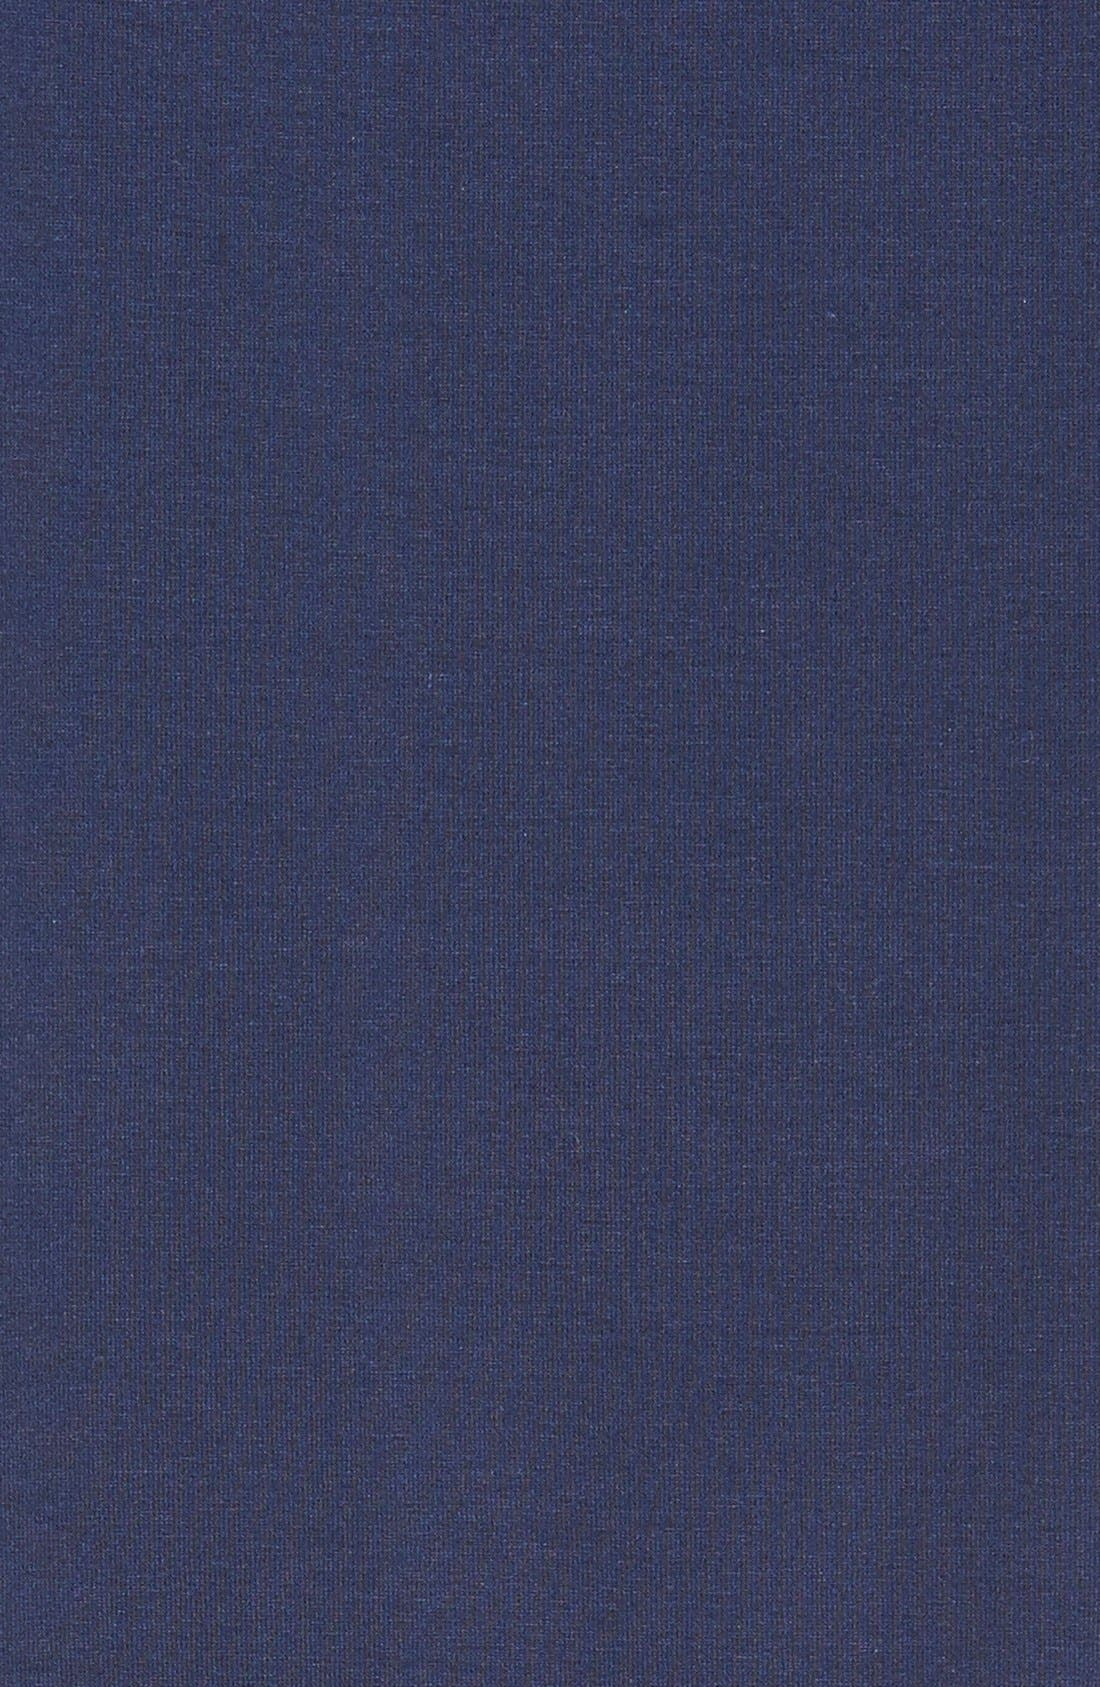 Alternate Image 3  - Eileen Fisher Wide Neck Jersey Shift Dress (Regular & Petite) (Online Only)